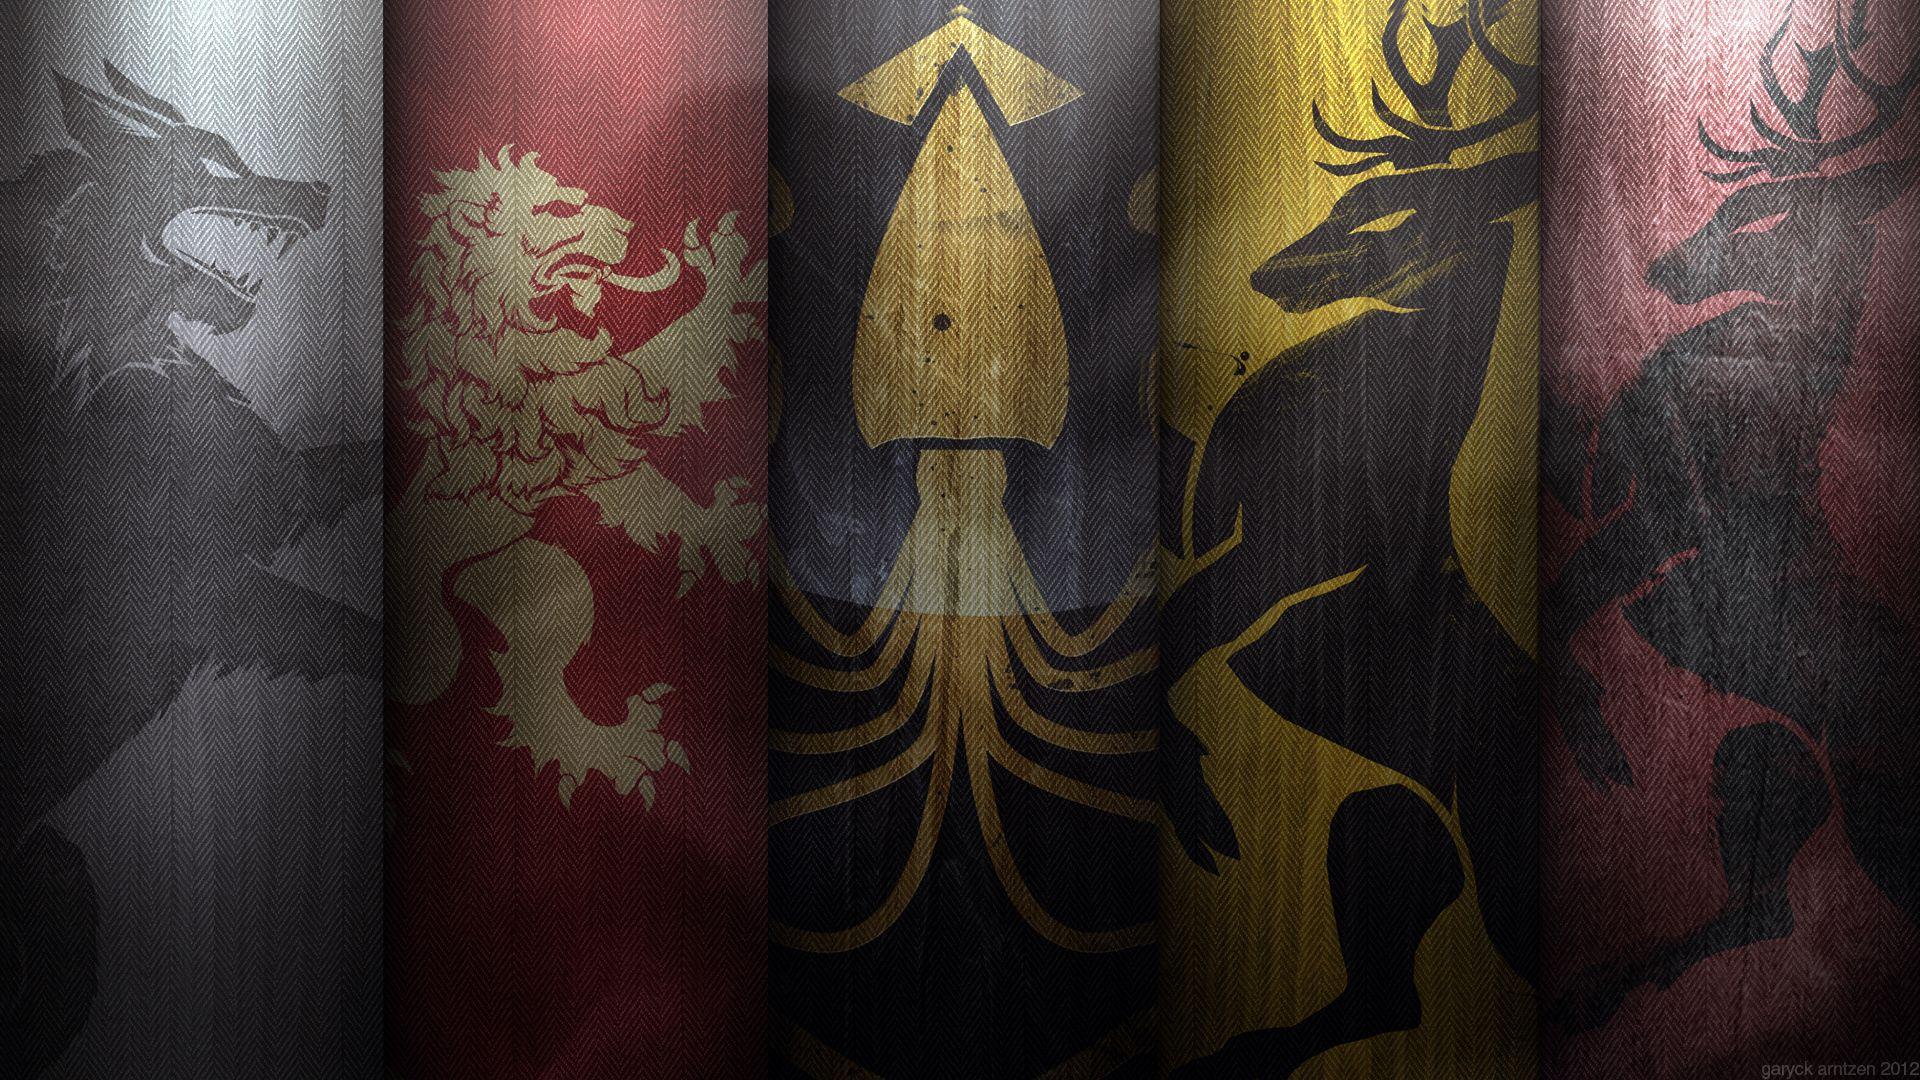 Game of Thrones Description Game of Thrones Wallpaper